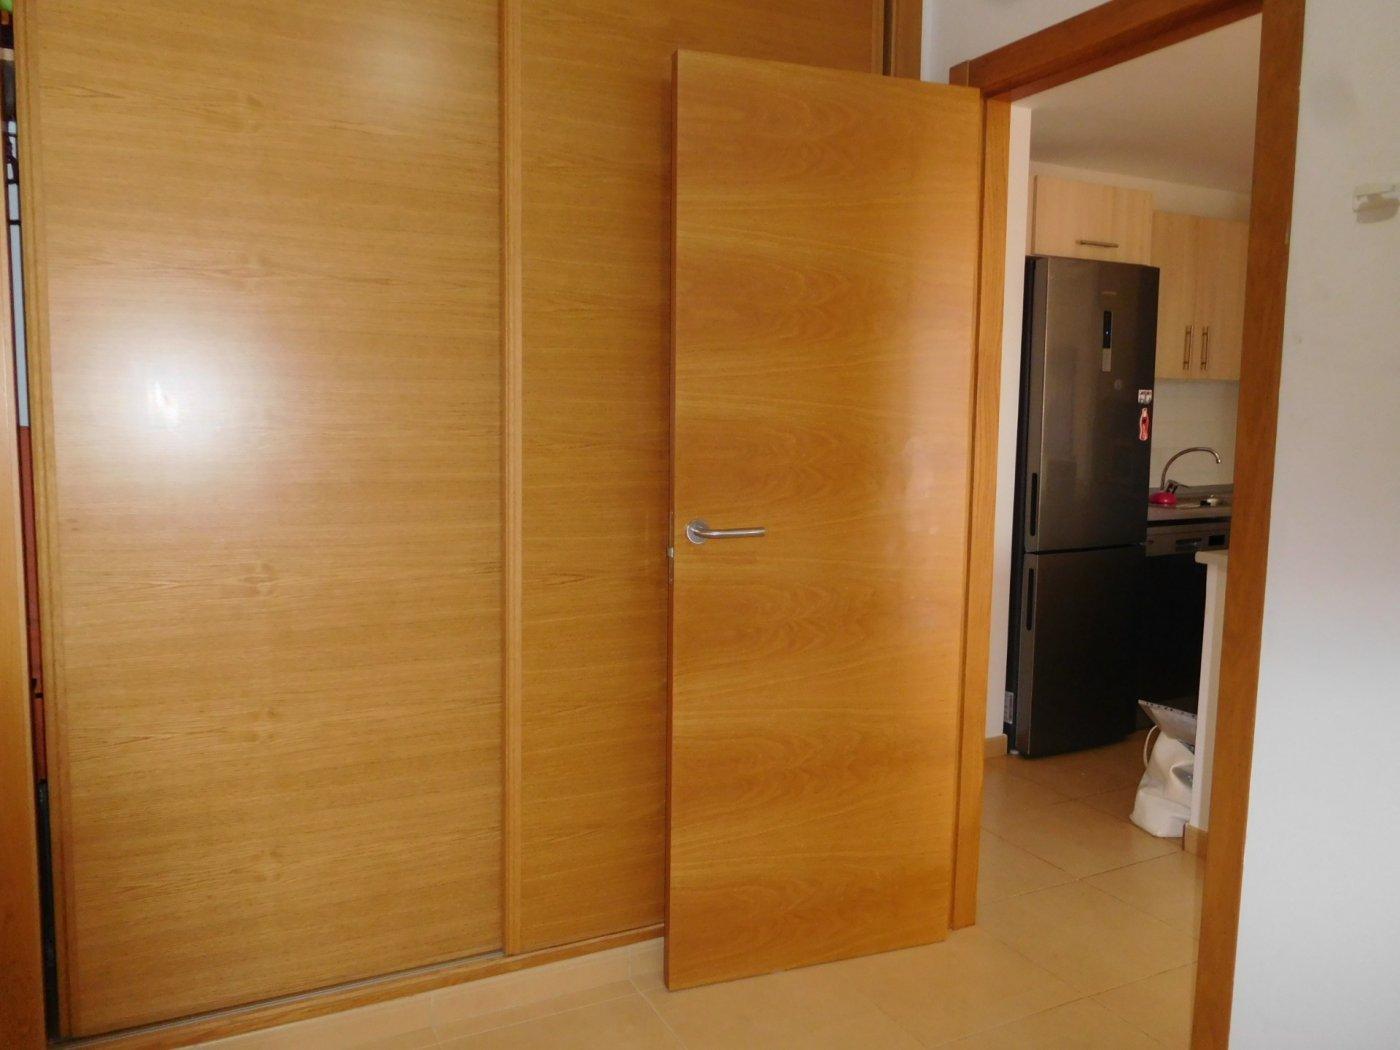 Gallery Image 13 of Apartment For rent in Condado De Alhama, Alhama De Murcia